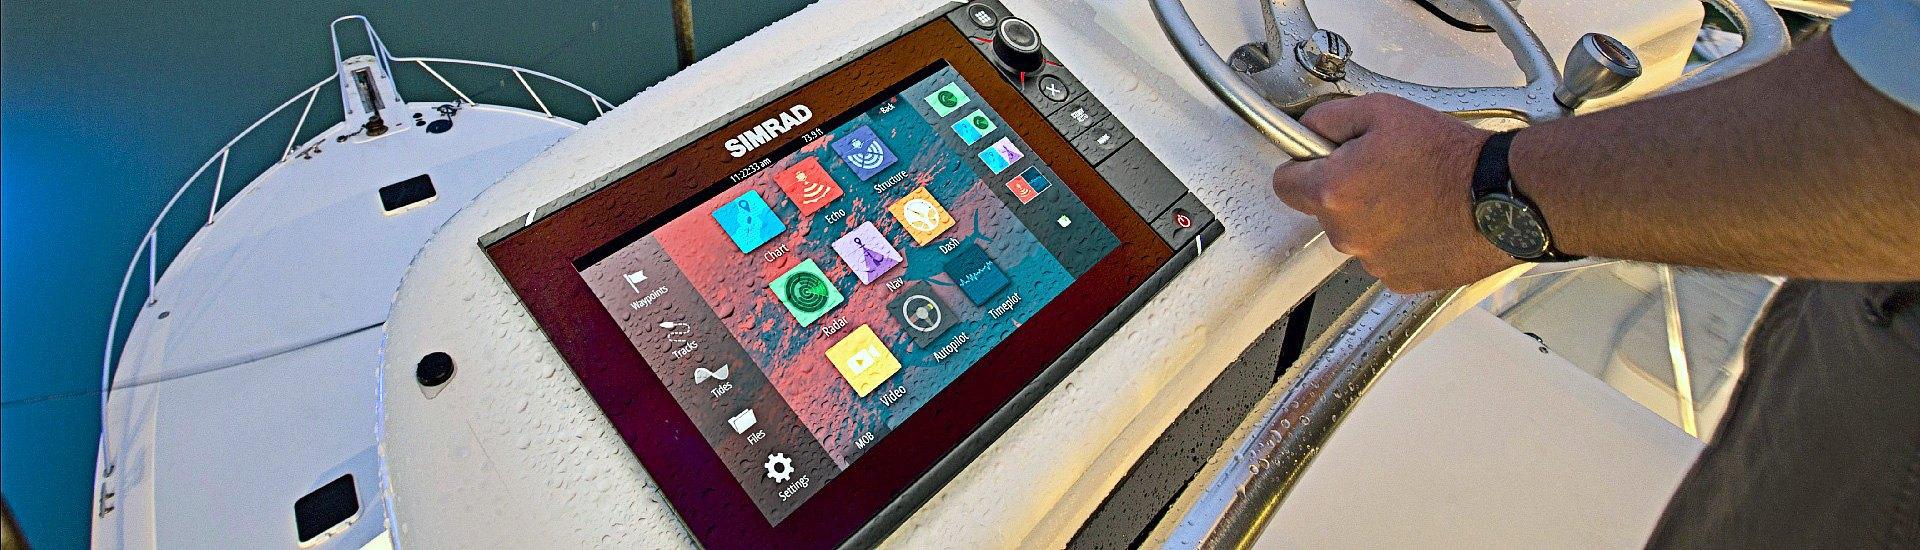 Marine Multifunction Displays & Combos | Keypads, Remotes